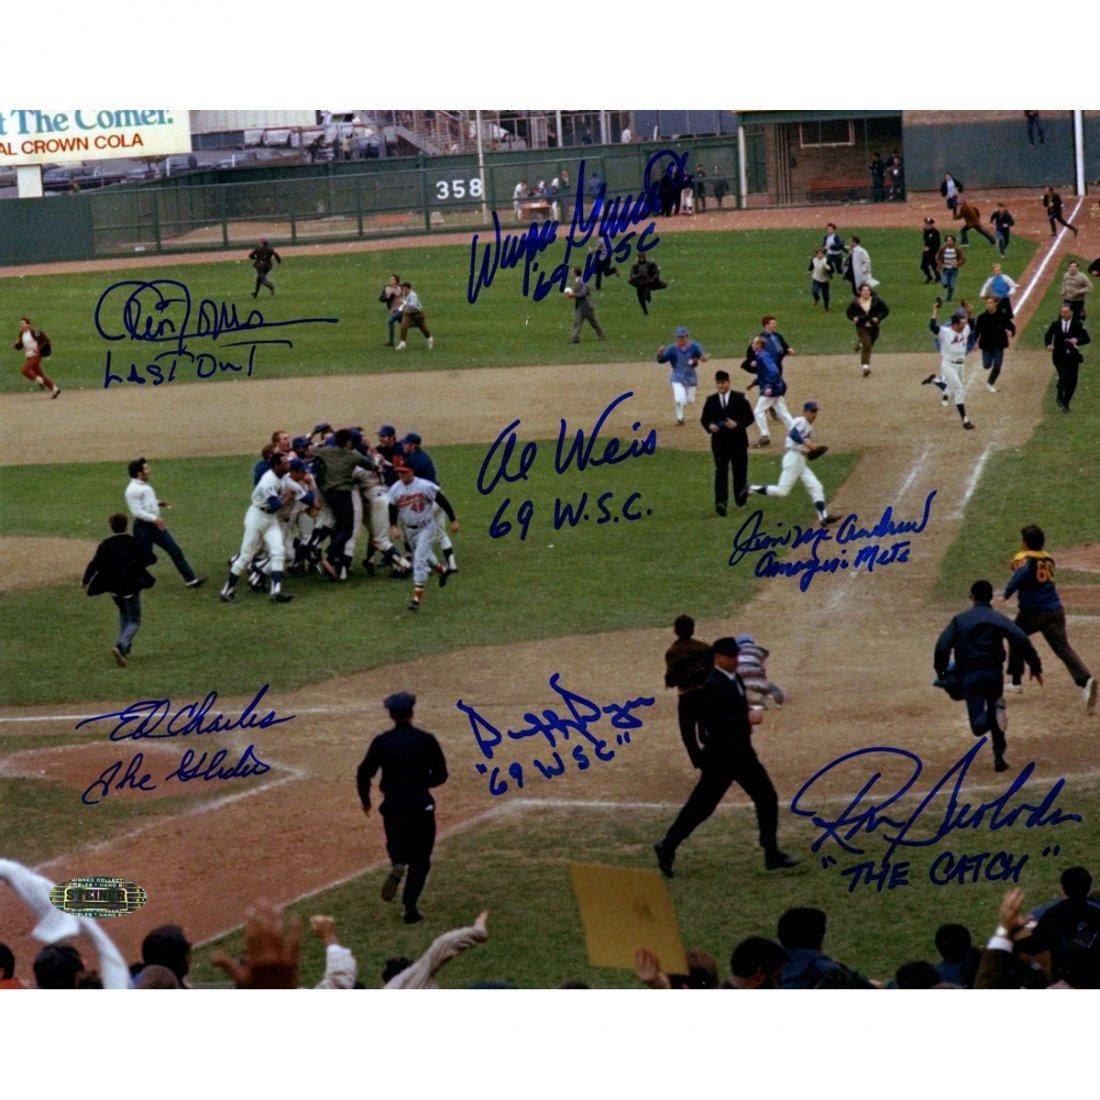 1969 New York Mets Multi Signed and Inscribed Celebrati